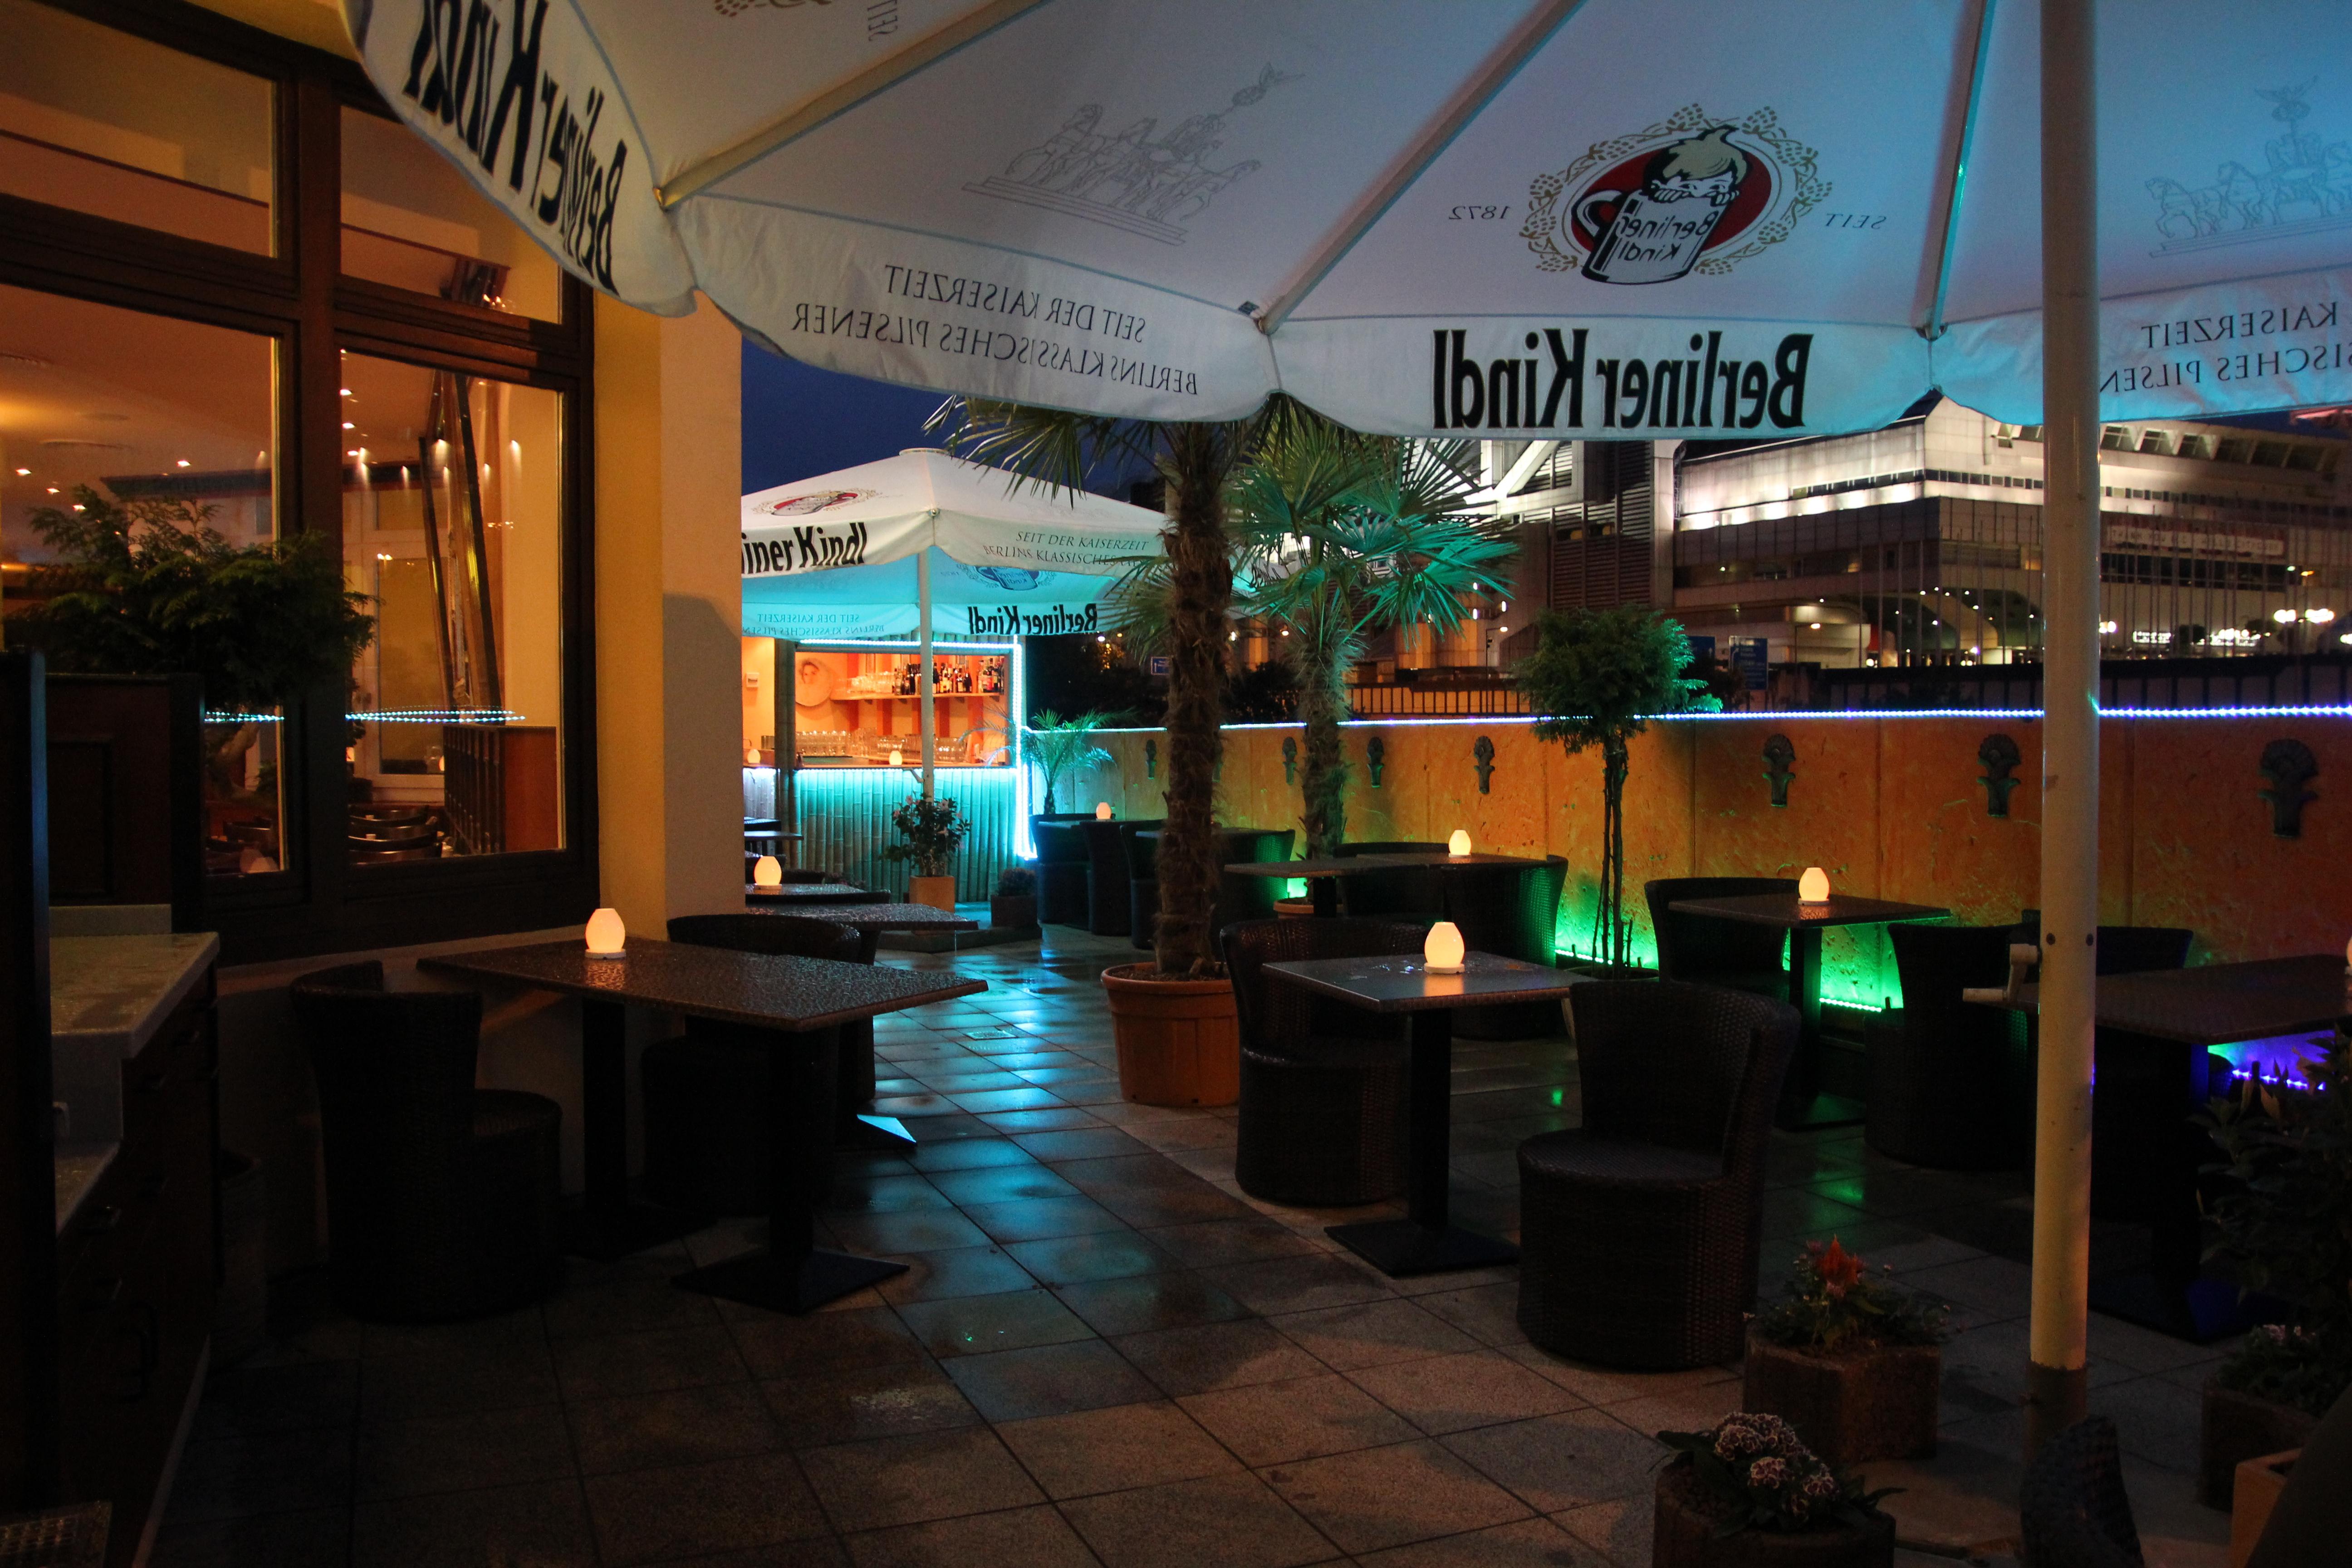 http://restaurant-hafis.com/wp-content/themes/thesis_18/custom/rotator/rotator6.jpg